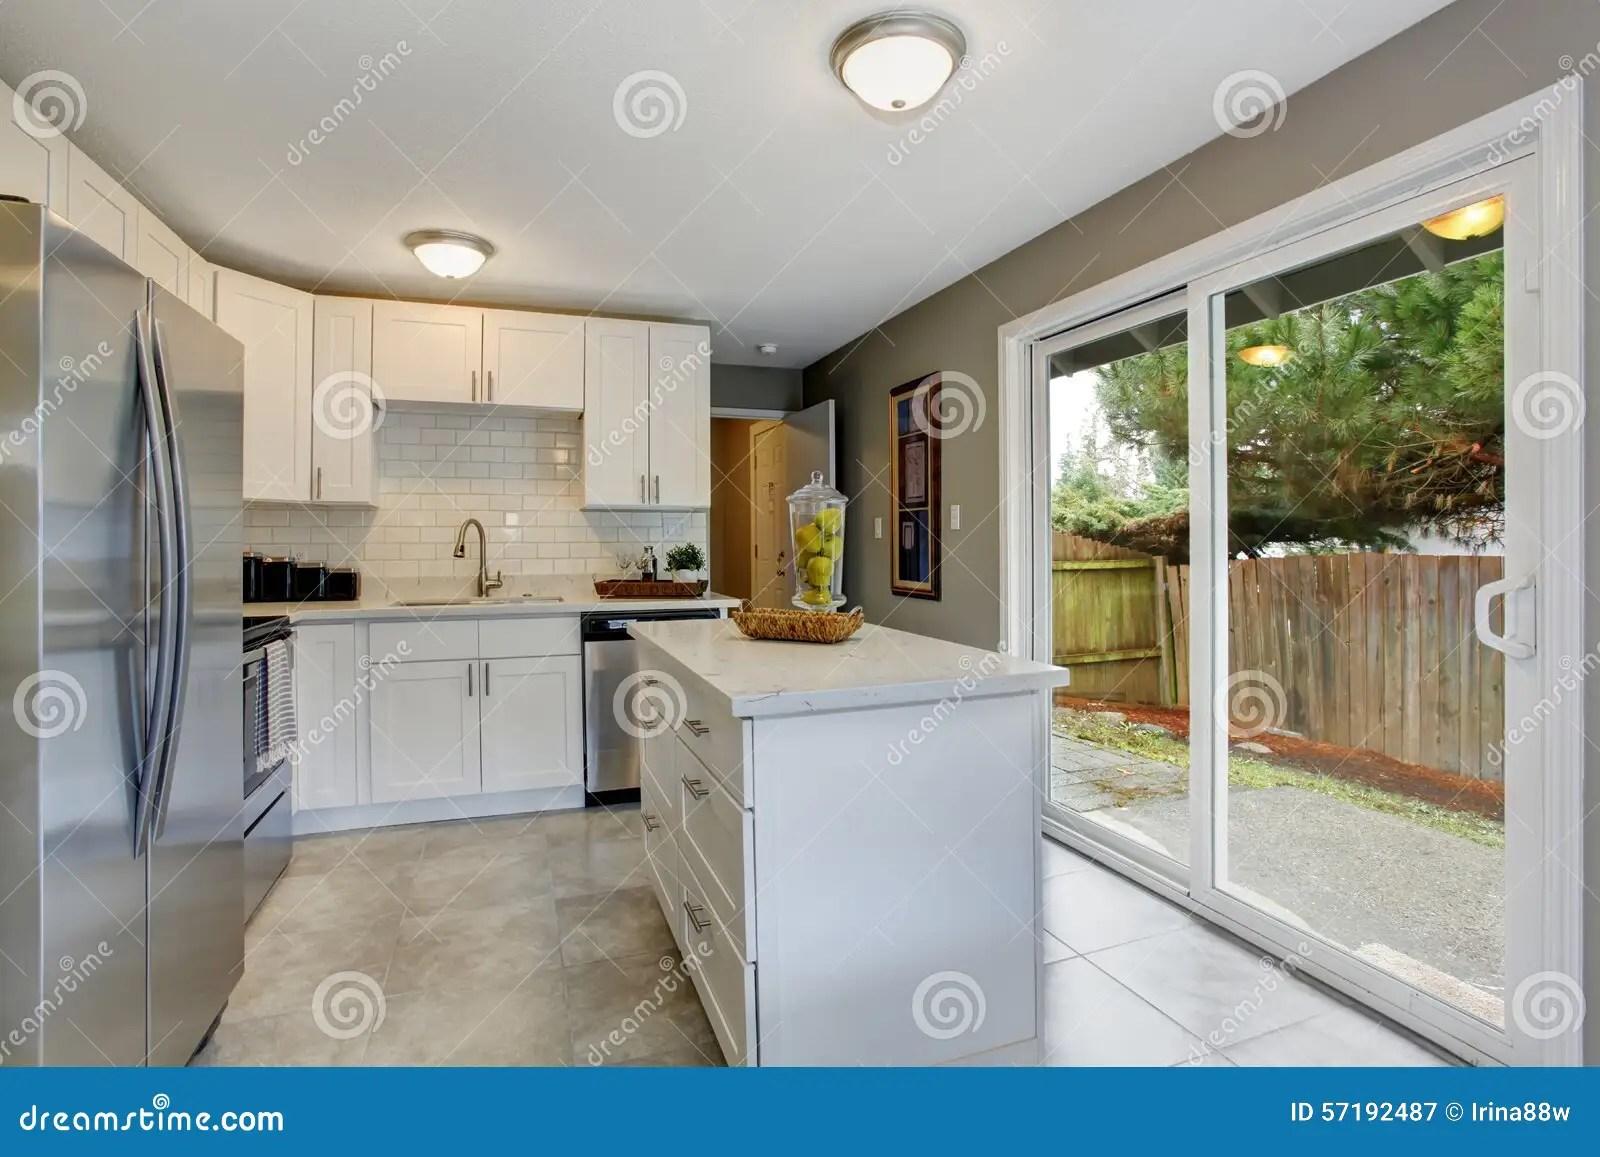 industrial kitchen stools door 有灰色和白色题材的现代化的厨房库存图片 图片包括有拱道 厨房 凳子 有灰色和白色题材的现代化的厨房